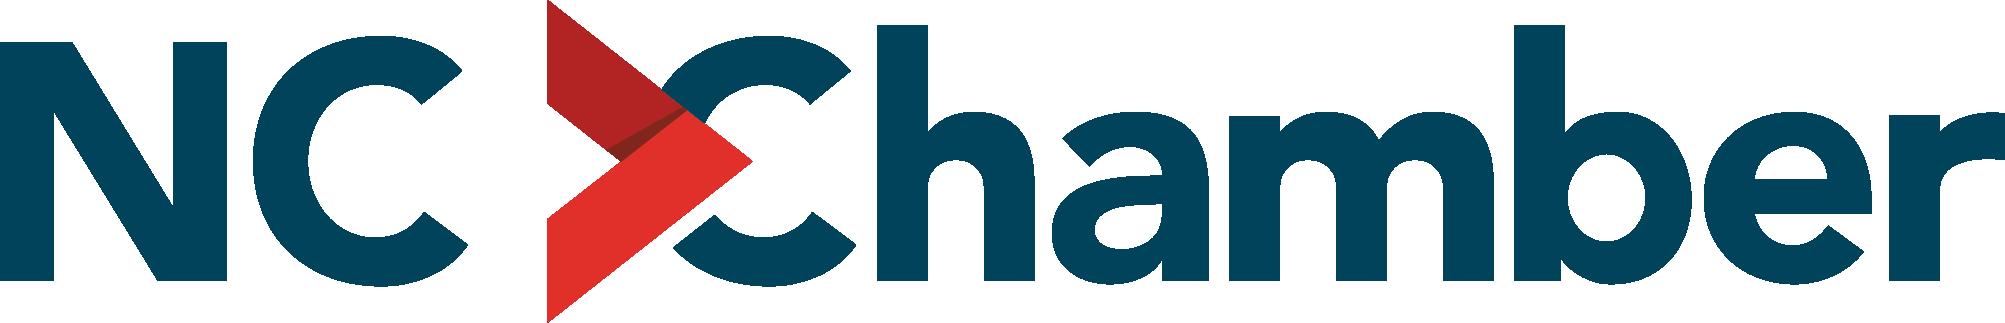 NC-Chamber-Logo